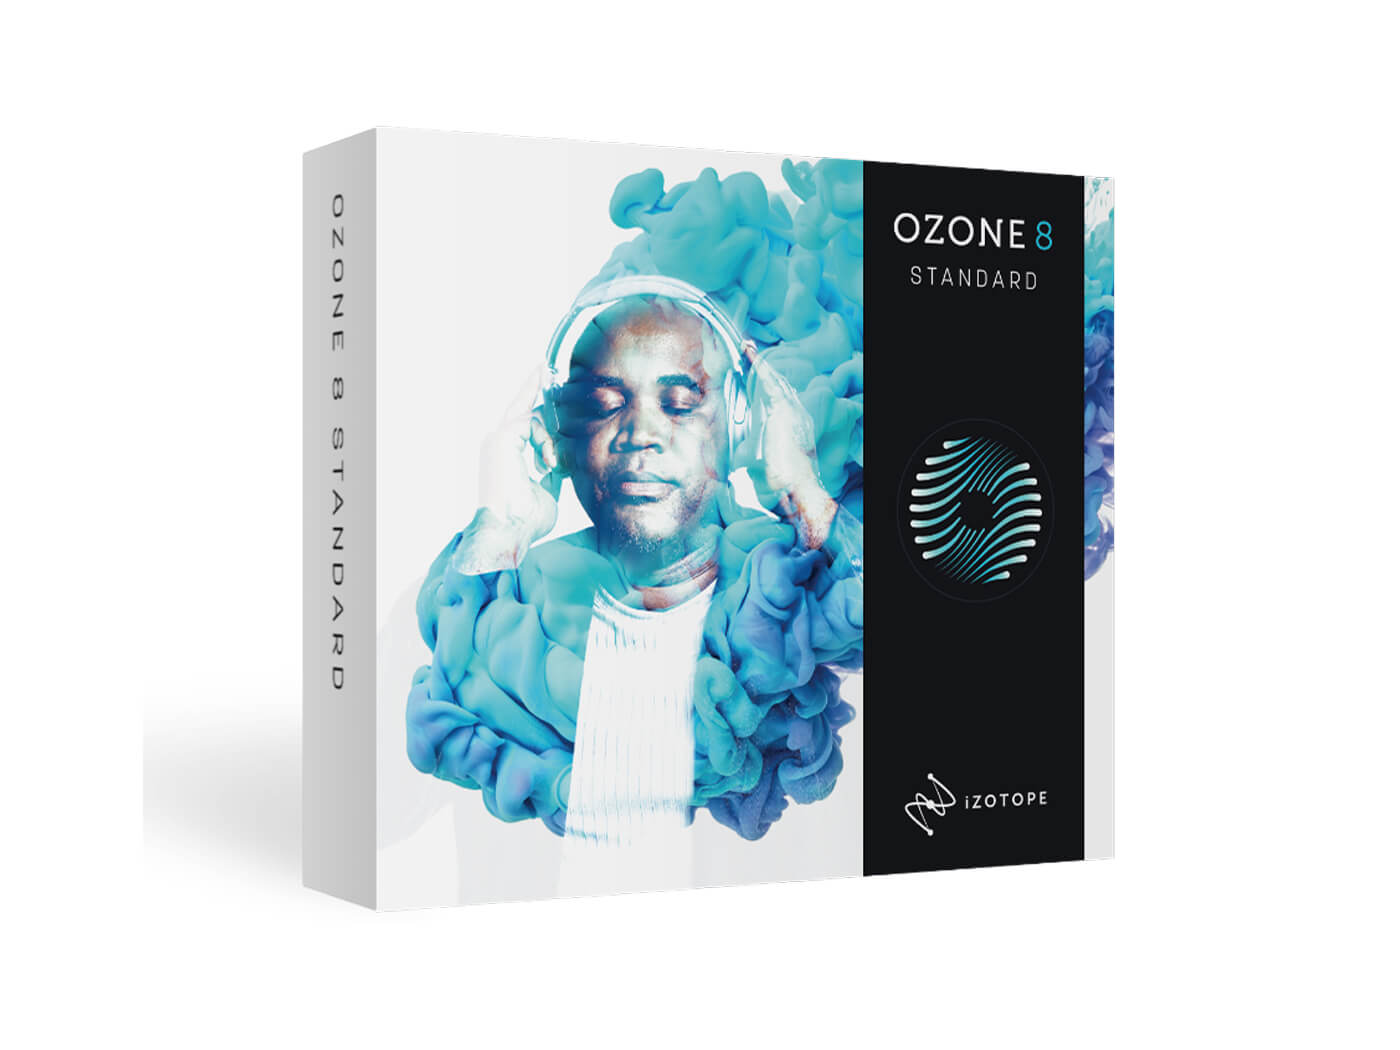 iZotope Ozone 8 Standard